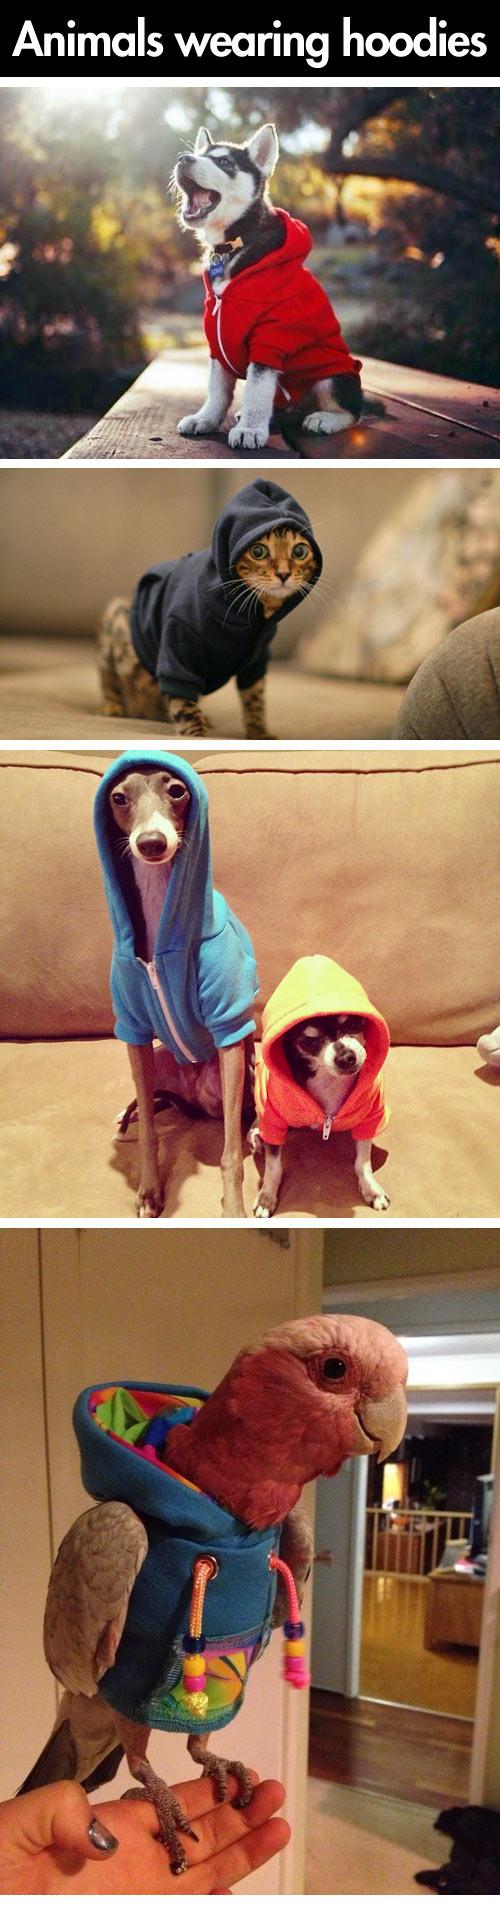 funny-animals-wearing-hoodies